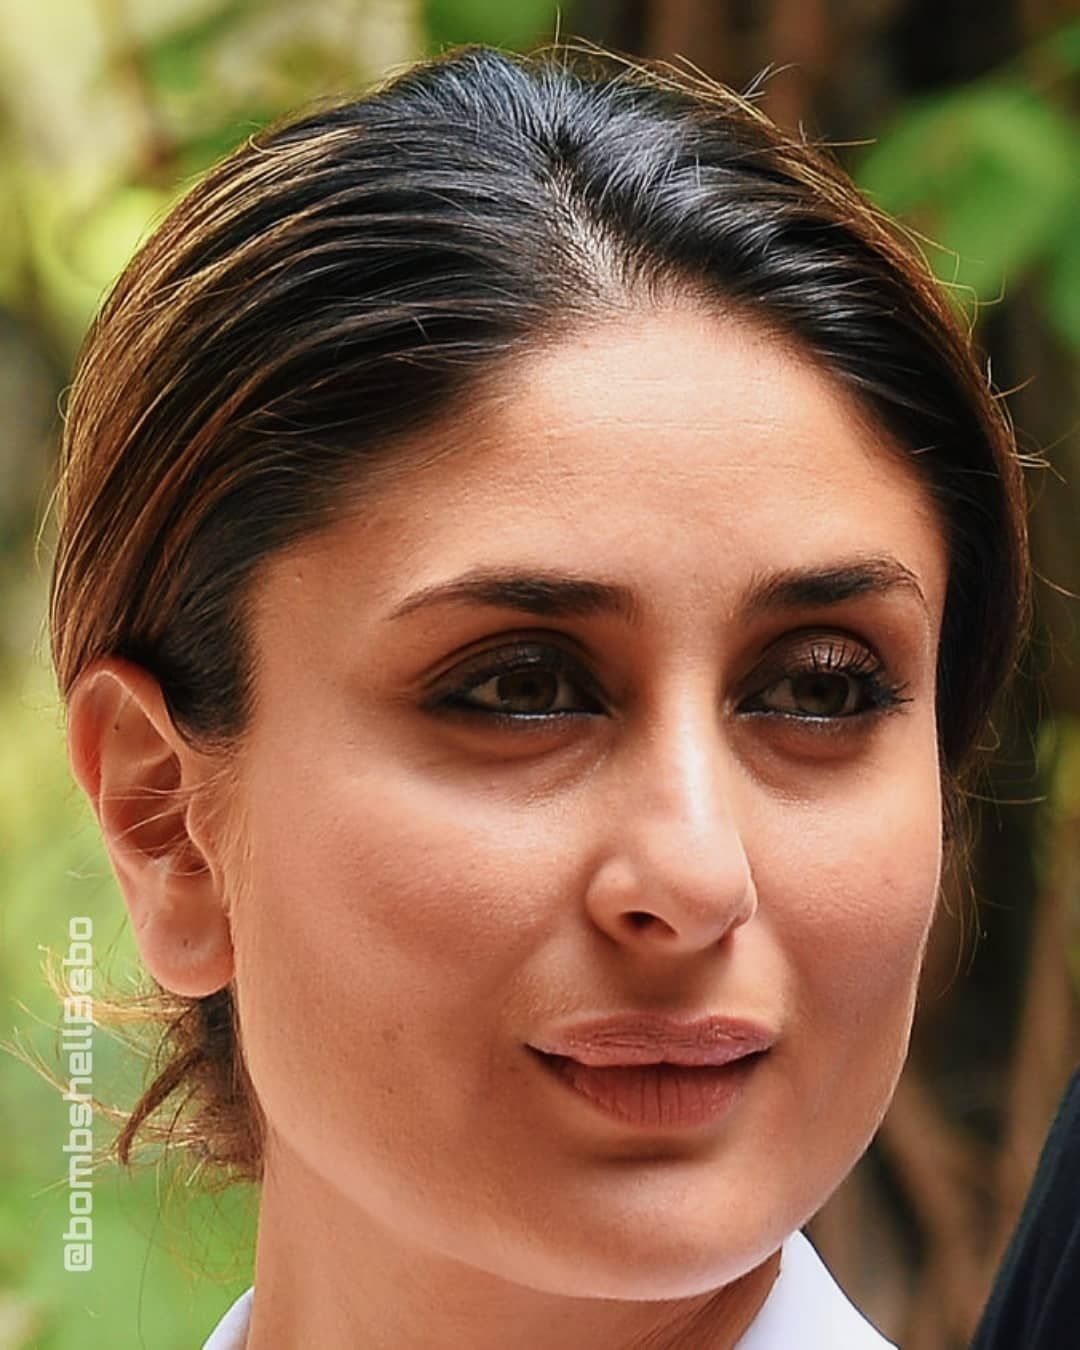 Kareenakapooraddicted On Instagram No Words For This Beauty Kareenakapoorkhan Kareenakapoorkhan Kareenabebo K Actresses Kareena Kapoor Beauty